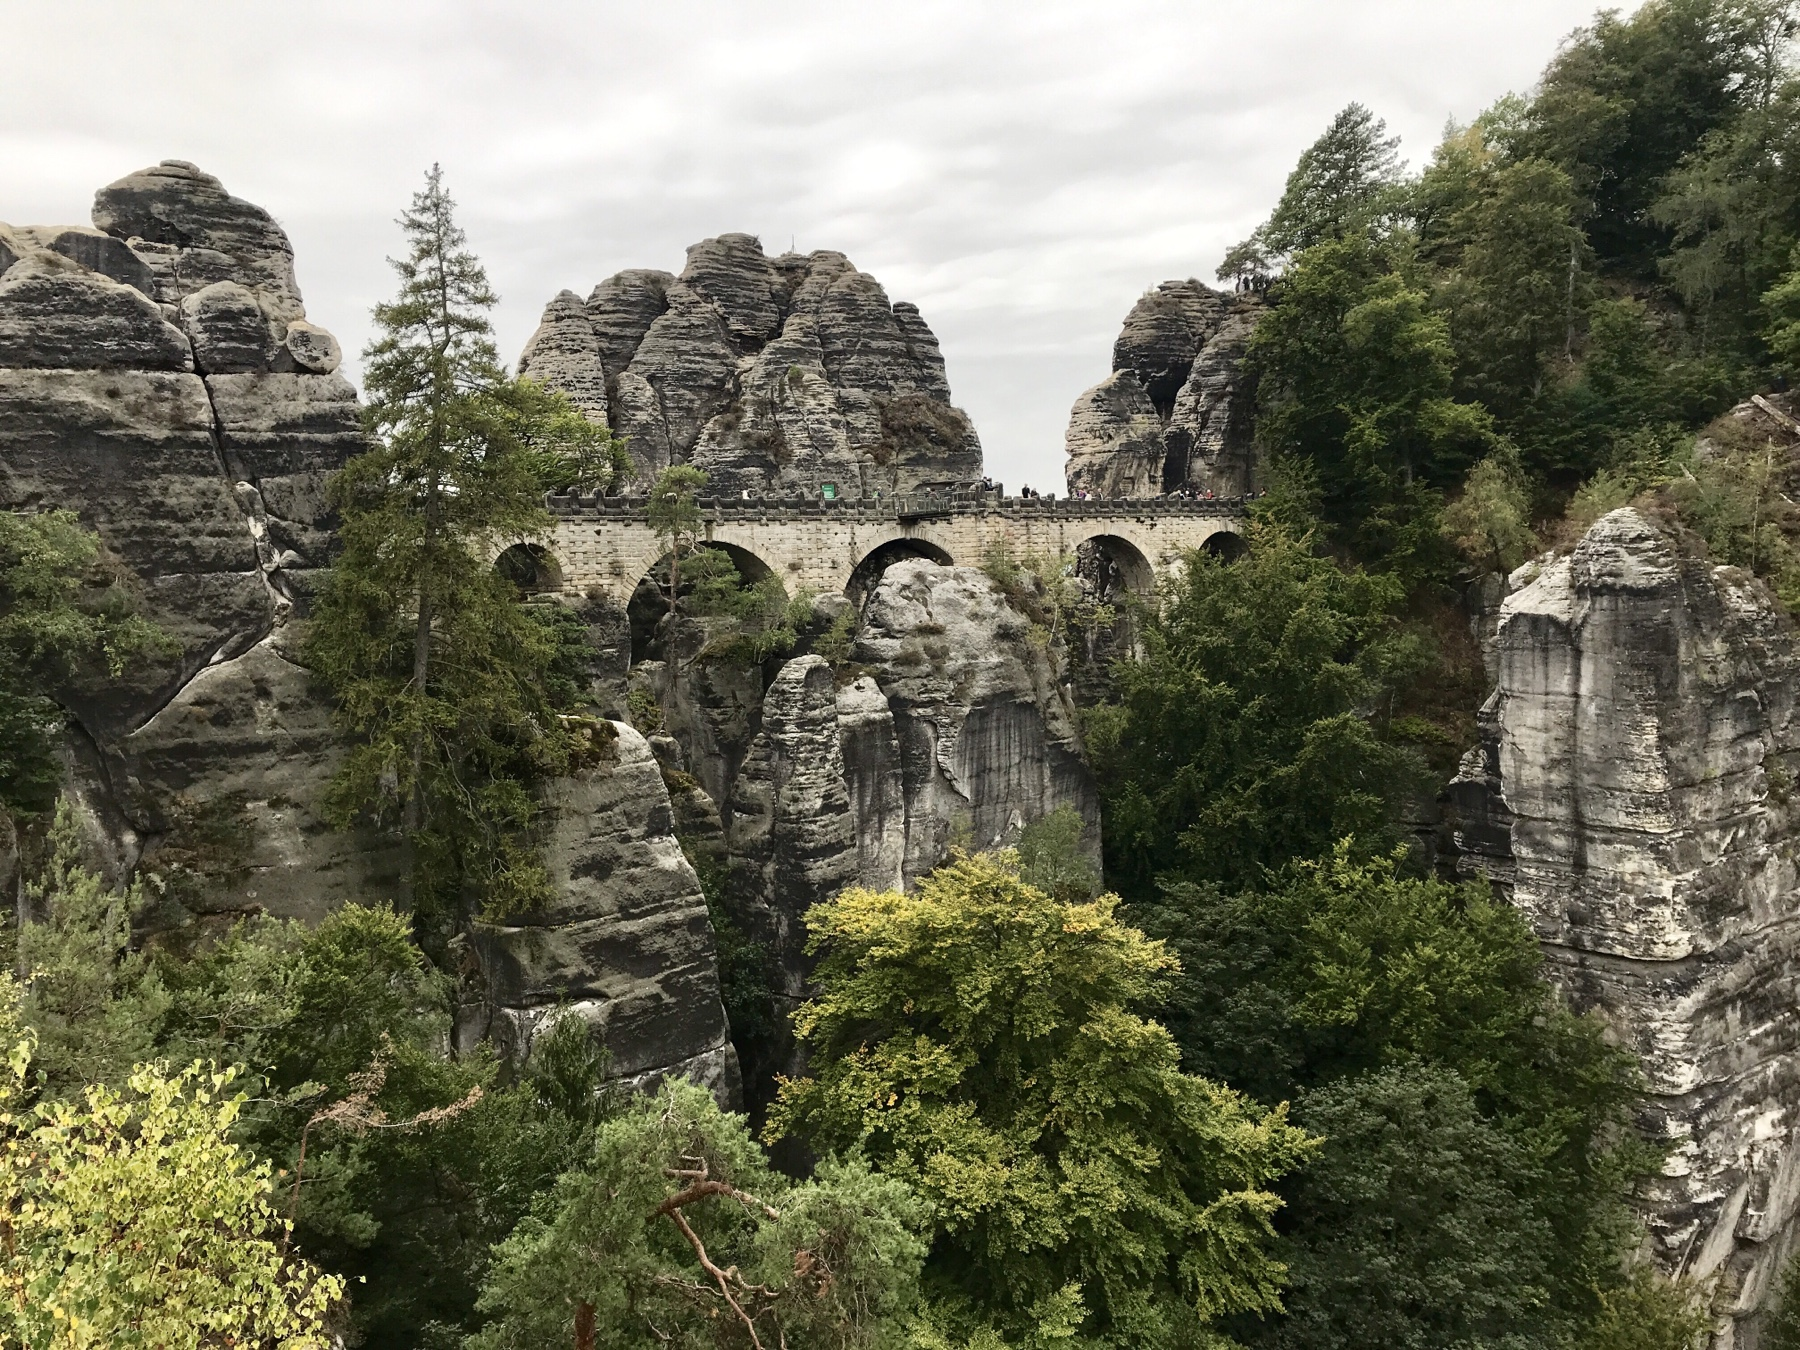 Basteibrücke Felsenburg Neurathen Malerweg Etappe 2